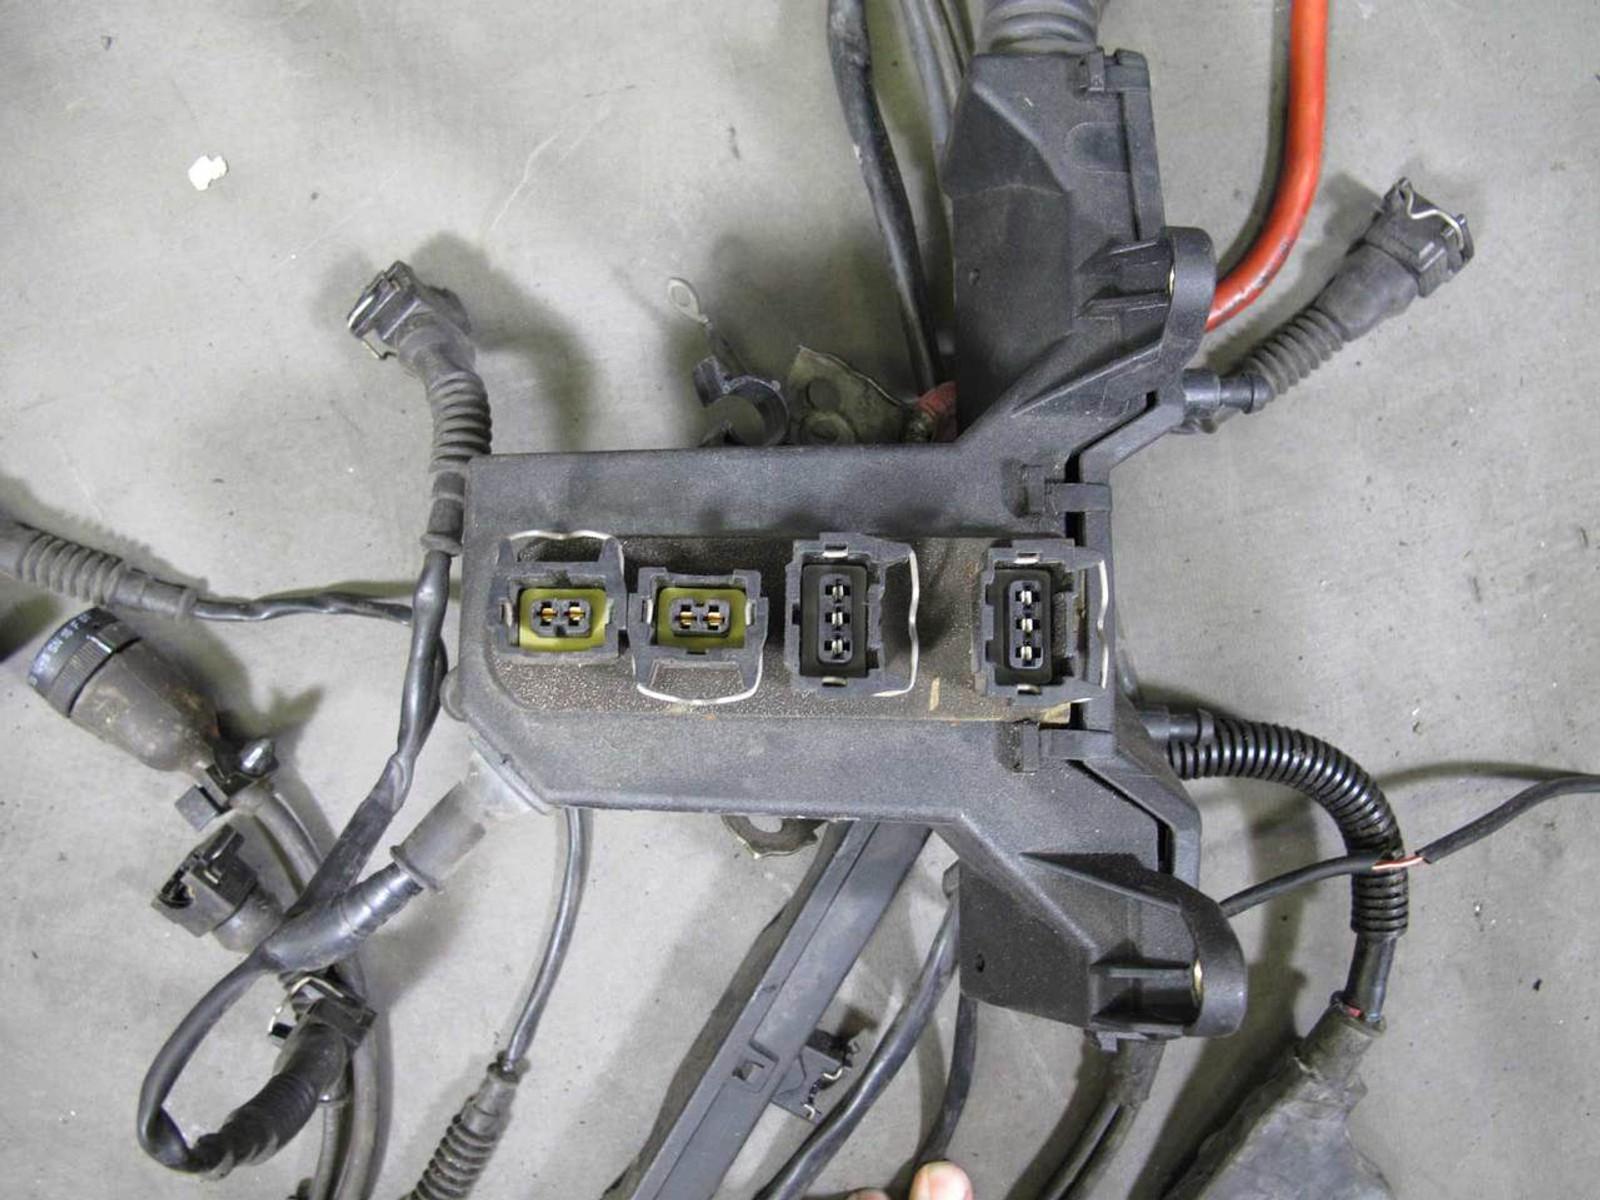 medium resolution of 1995 bmw wiring harness wiring diagram 1995 bmw 525i engine wiring harness 1995 bmw e36 318i